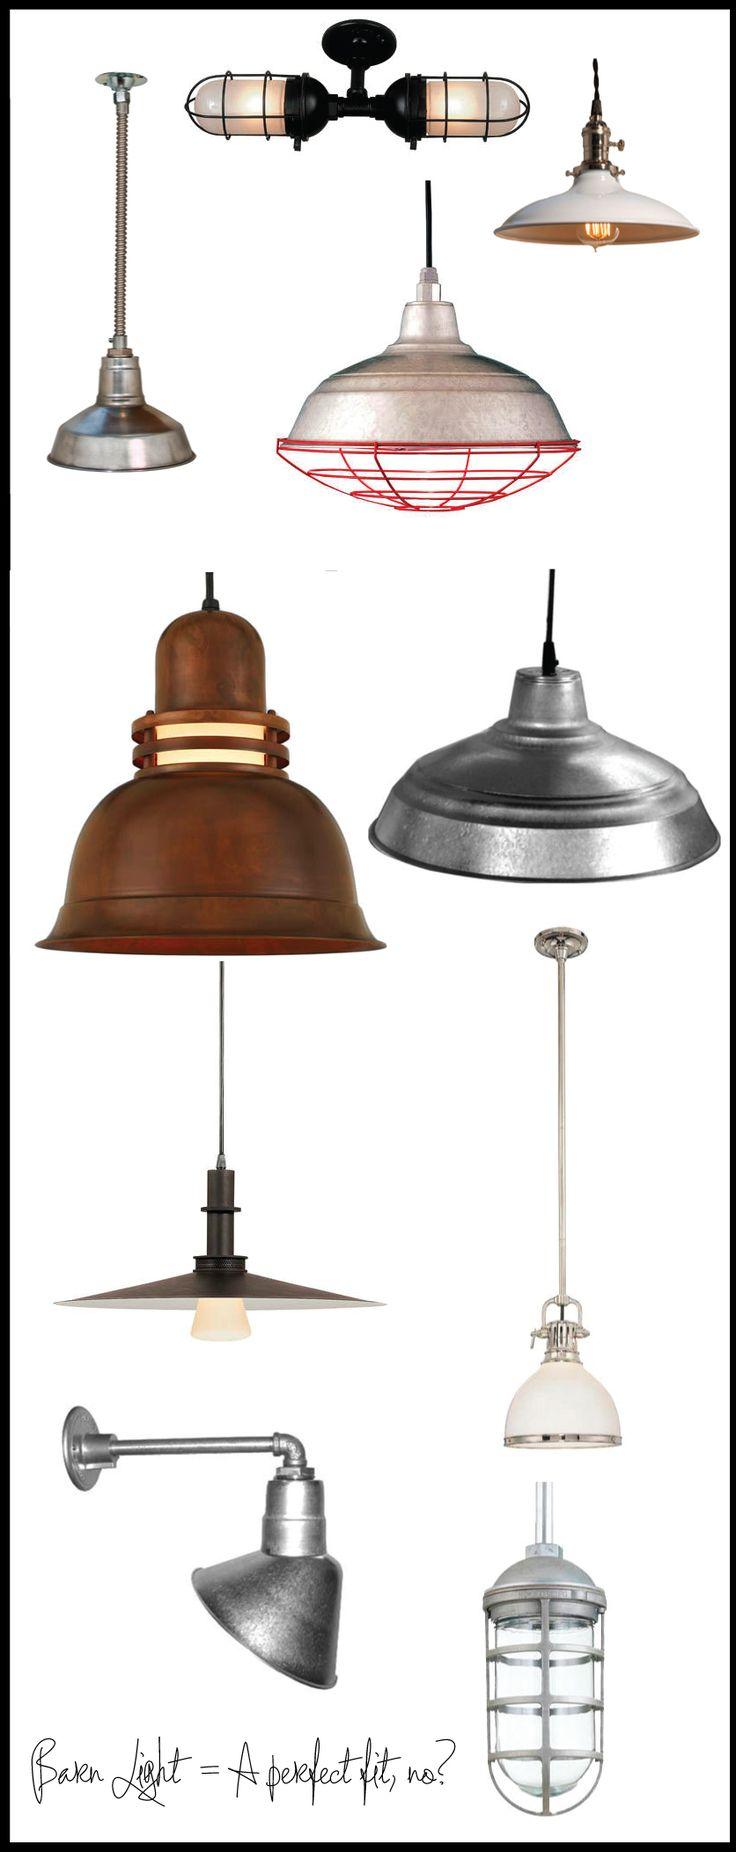 63 best images about diy light fixtures on pinterest for Diy rustic pendant light